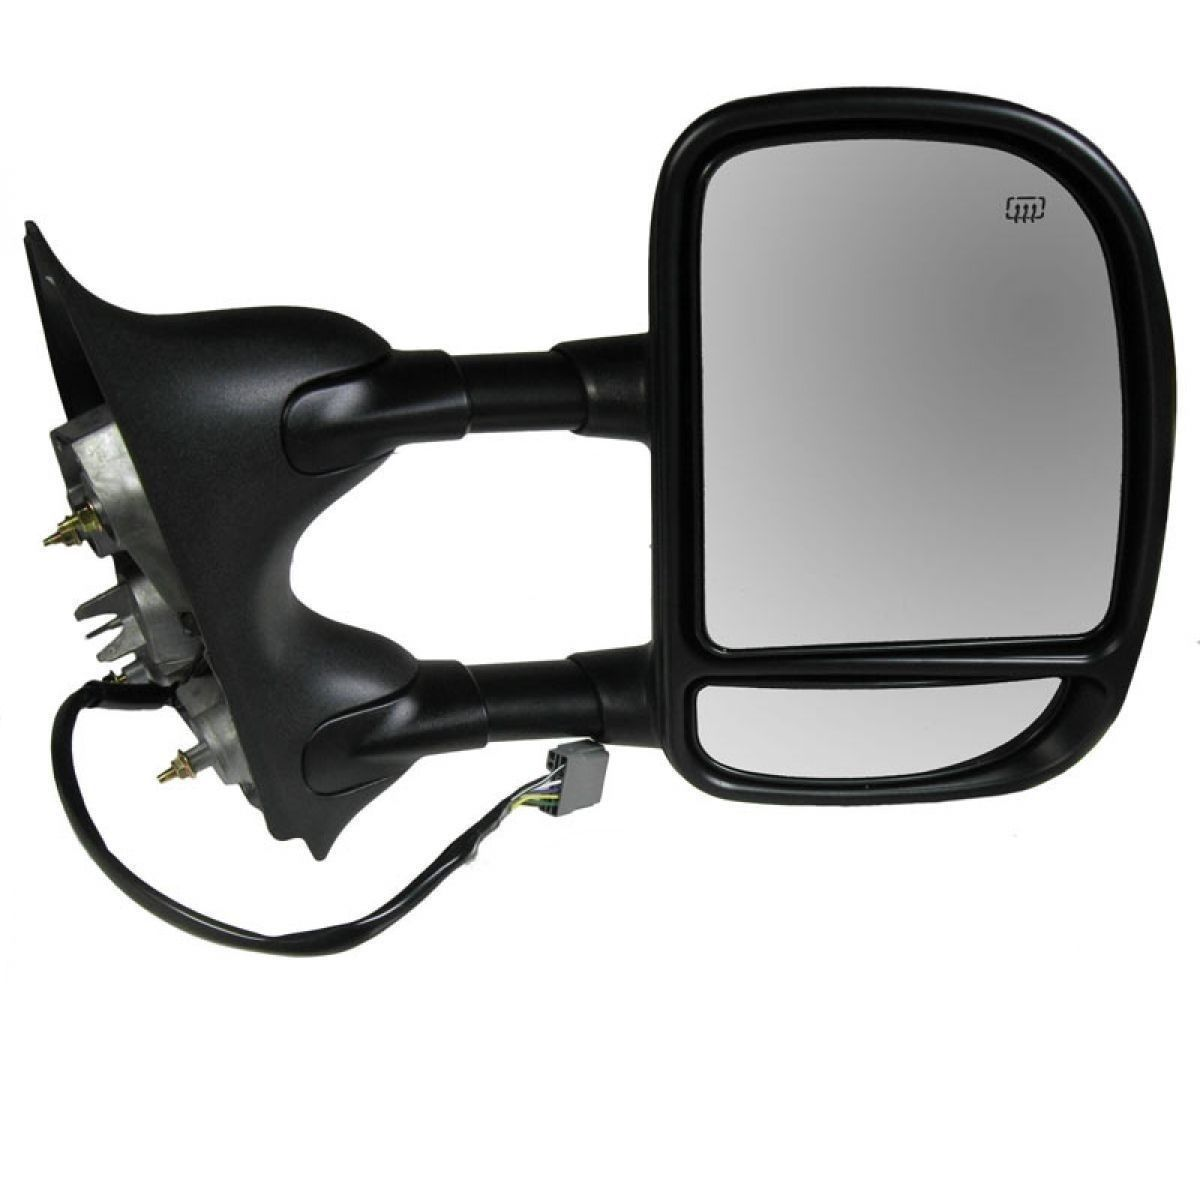 USミラー 新しいパワートーイングパッセンジャーミラーフォードスーパーデューティw /ライフタイム保証 New Power Towing Passenger Mirror for a Ford Super Duty w/Lifetime Warranty